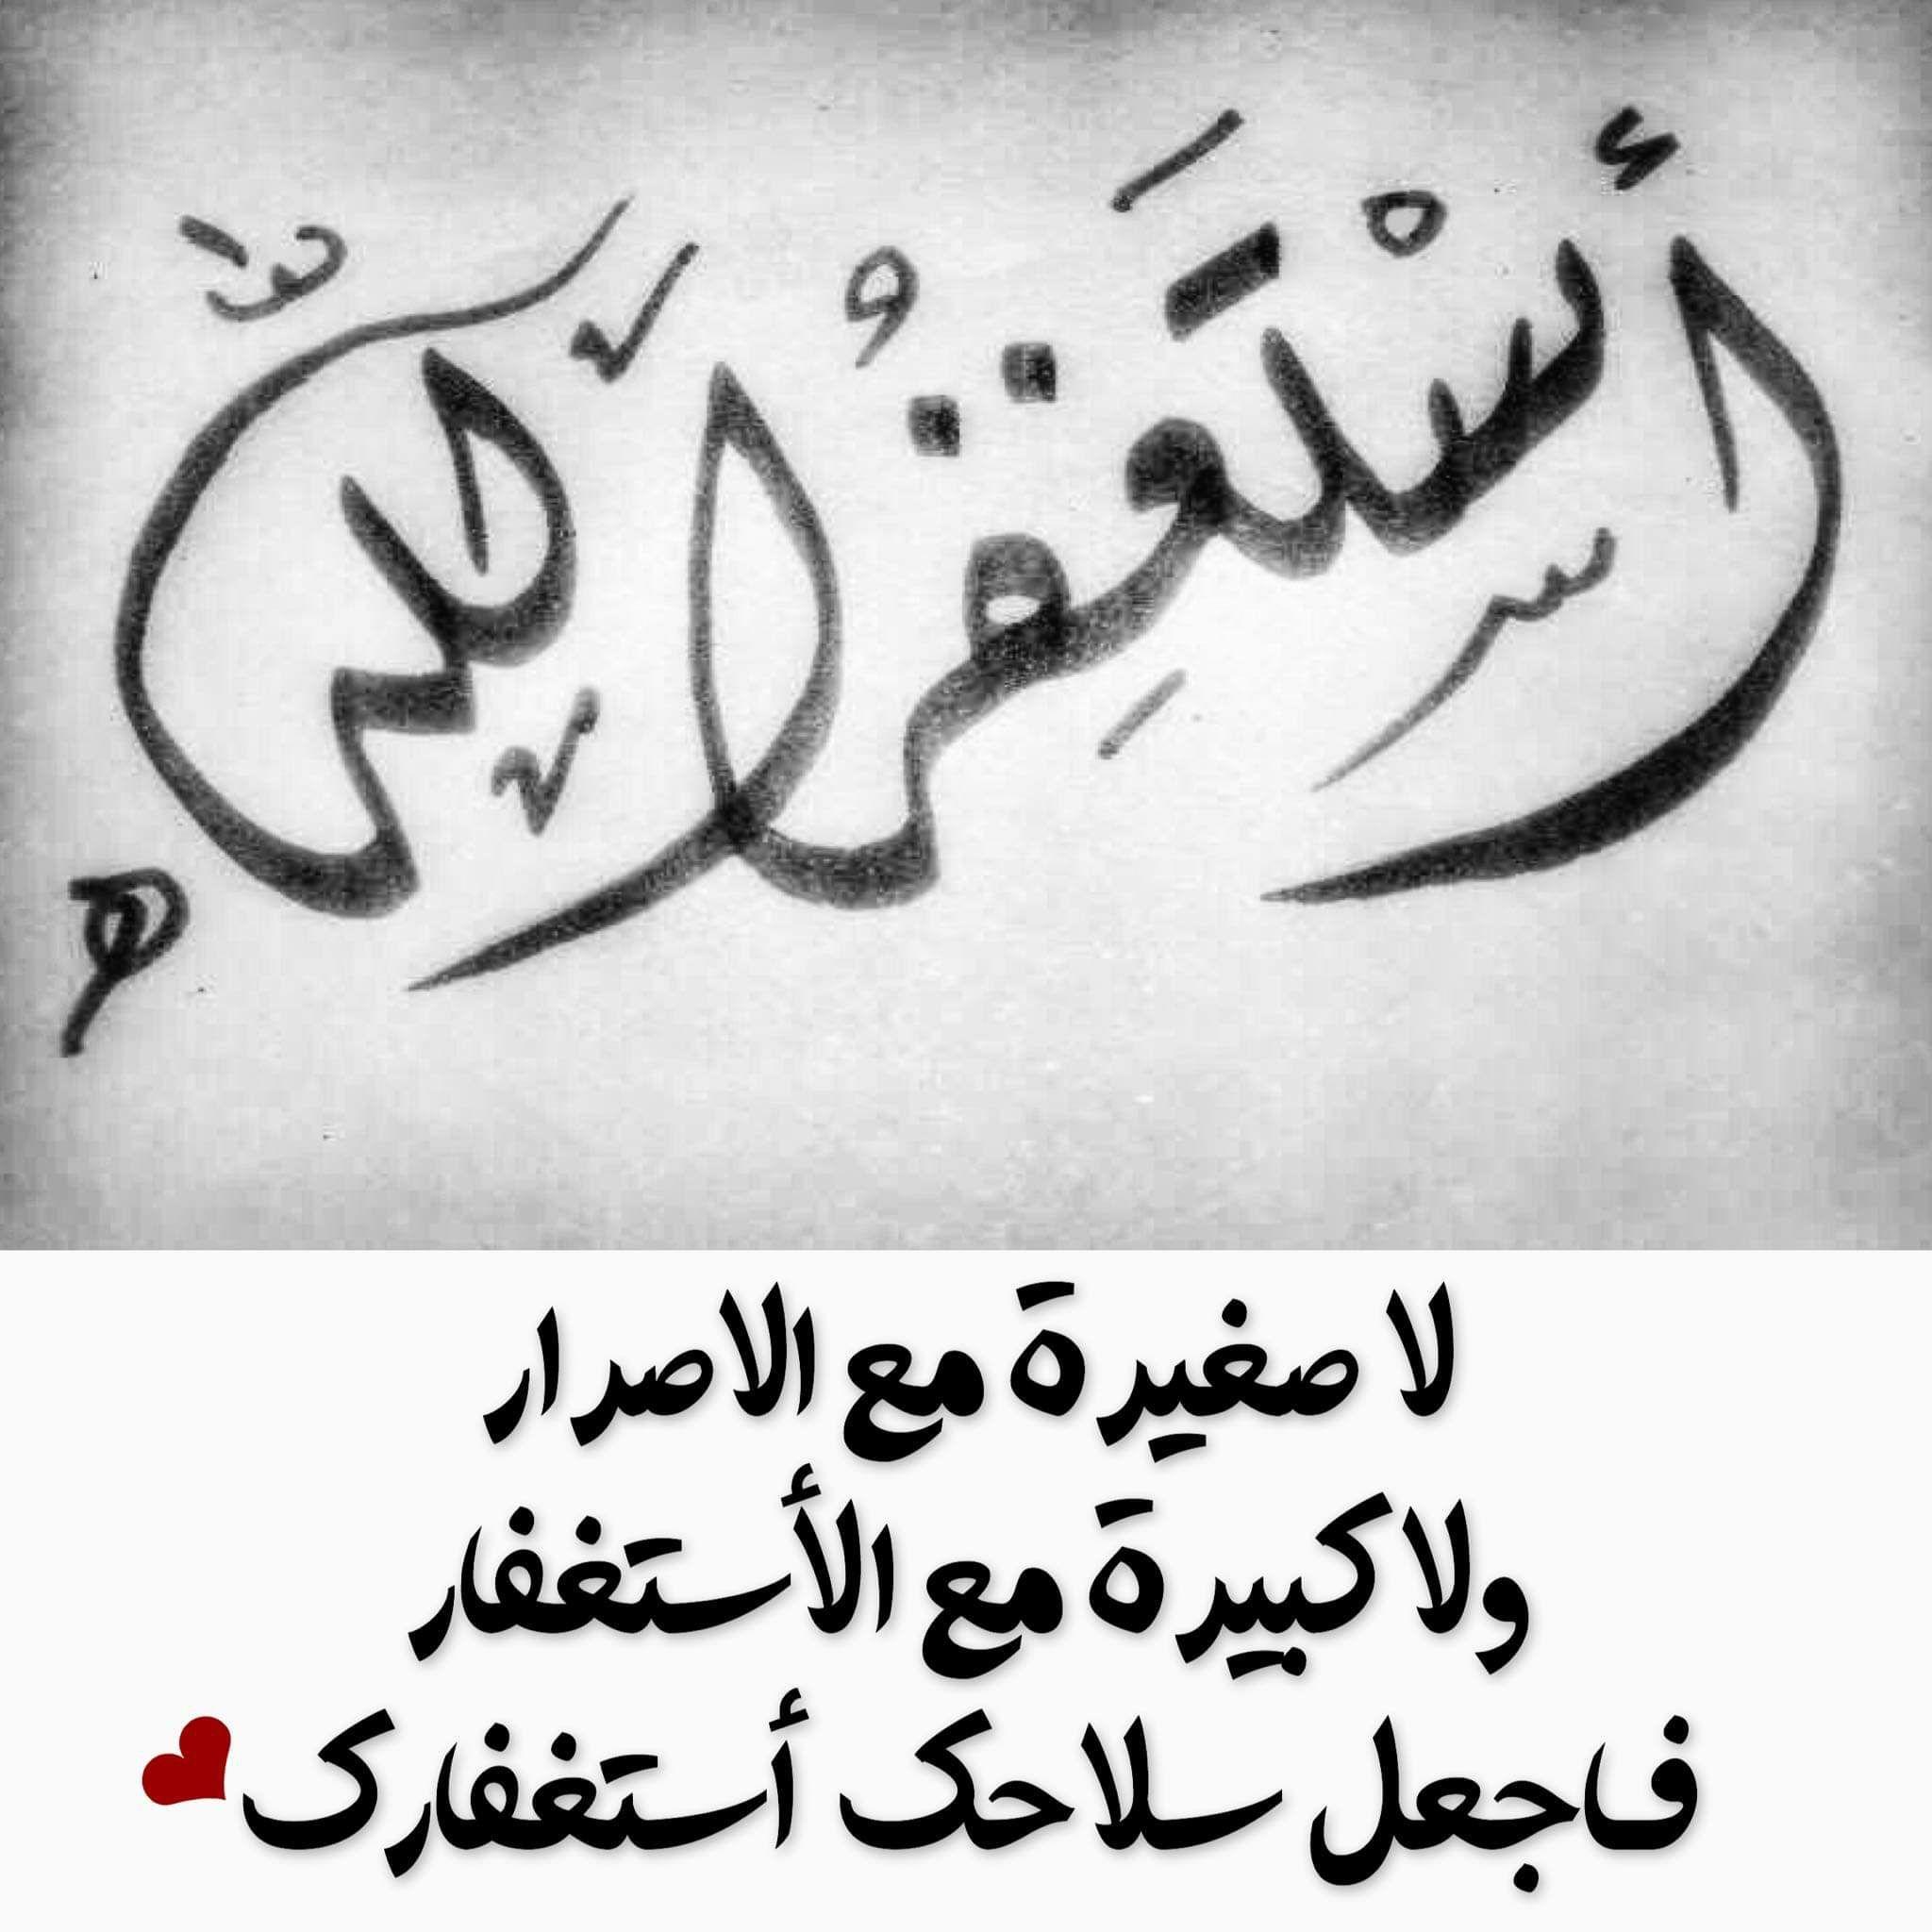 خواطر اسلامية بالصور Arabic Calligraphy Calligraphy